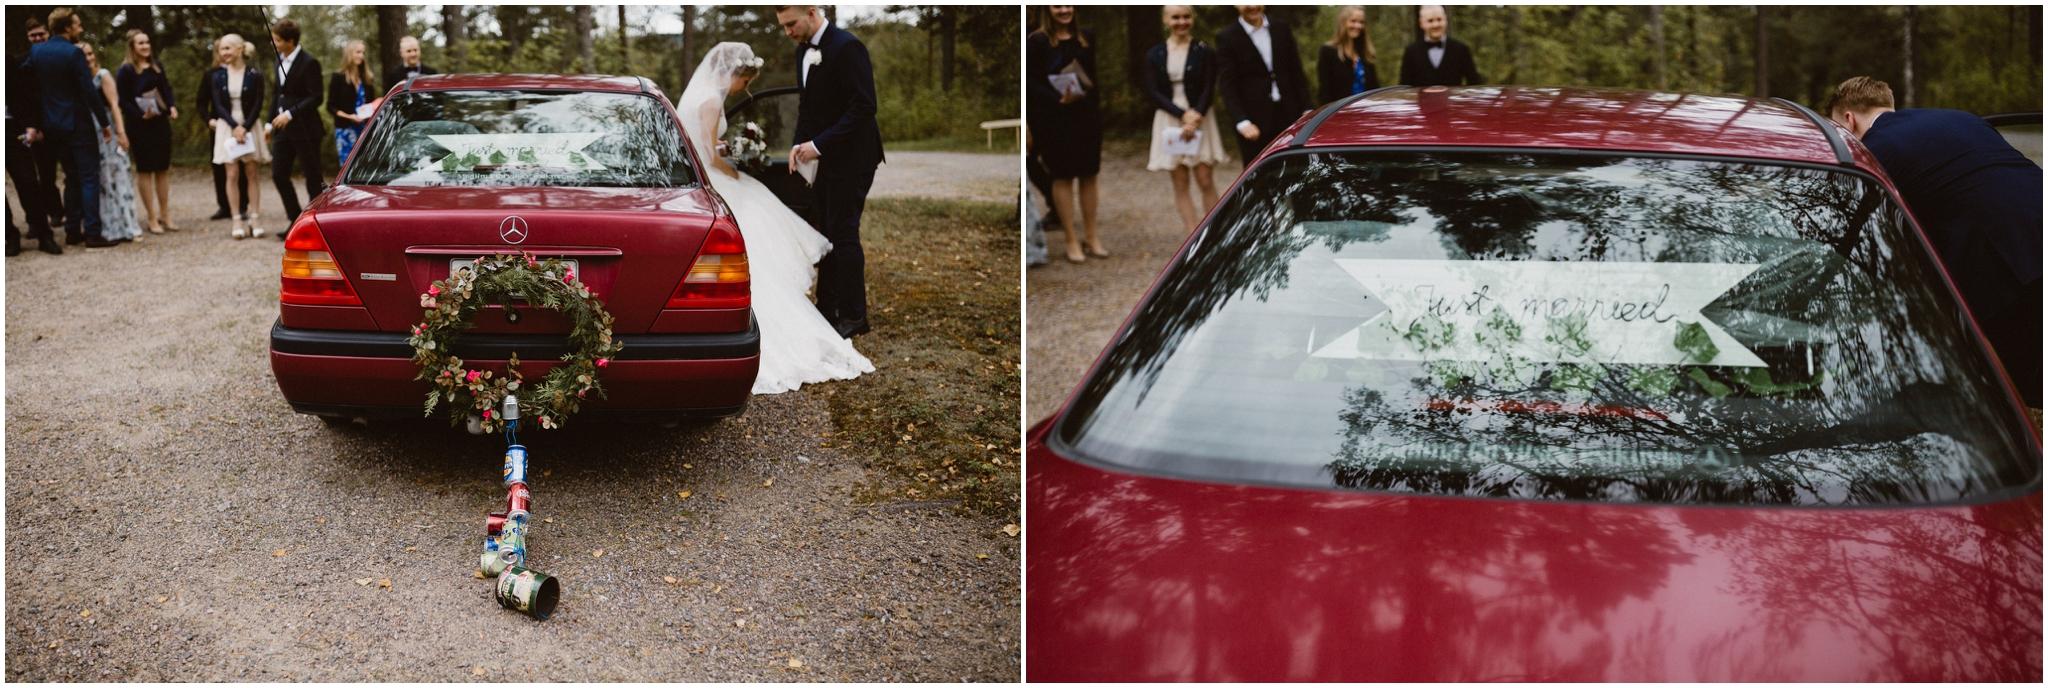 Leevi + Susanna -- Patrick Karkkolainen Wedding Photographer-199.jpg